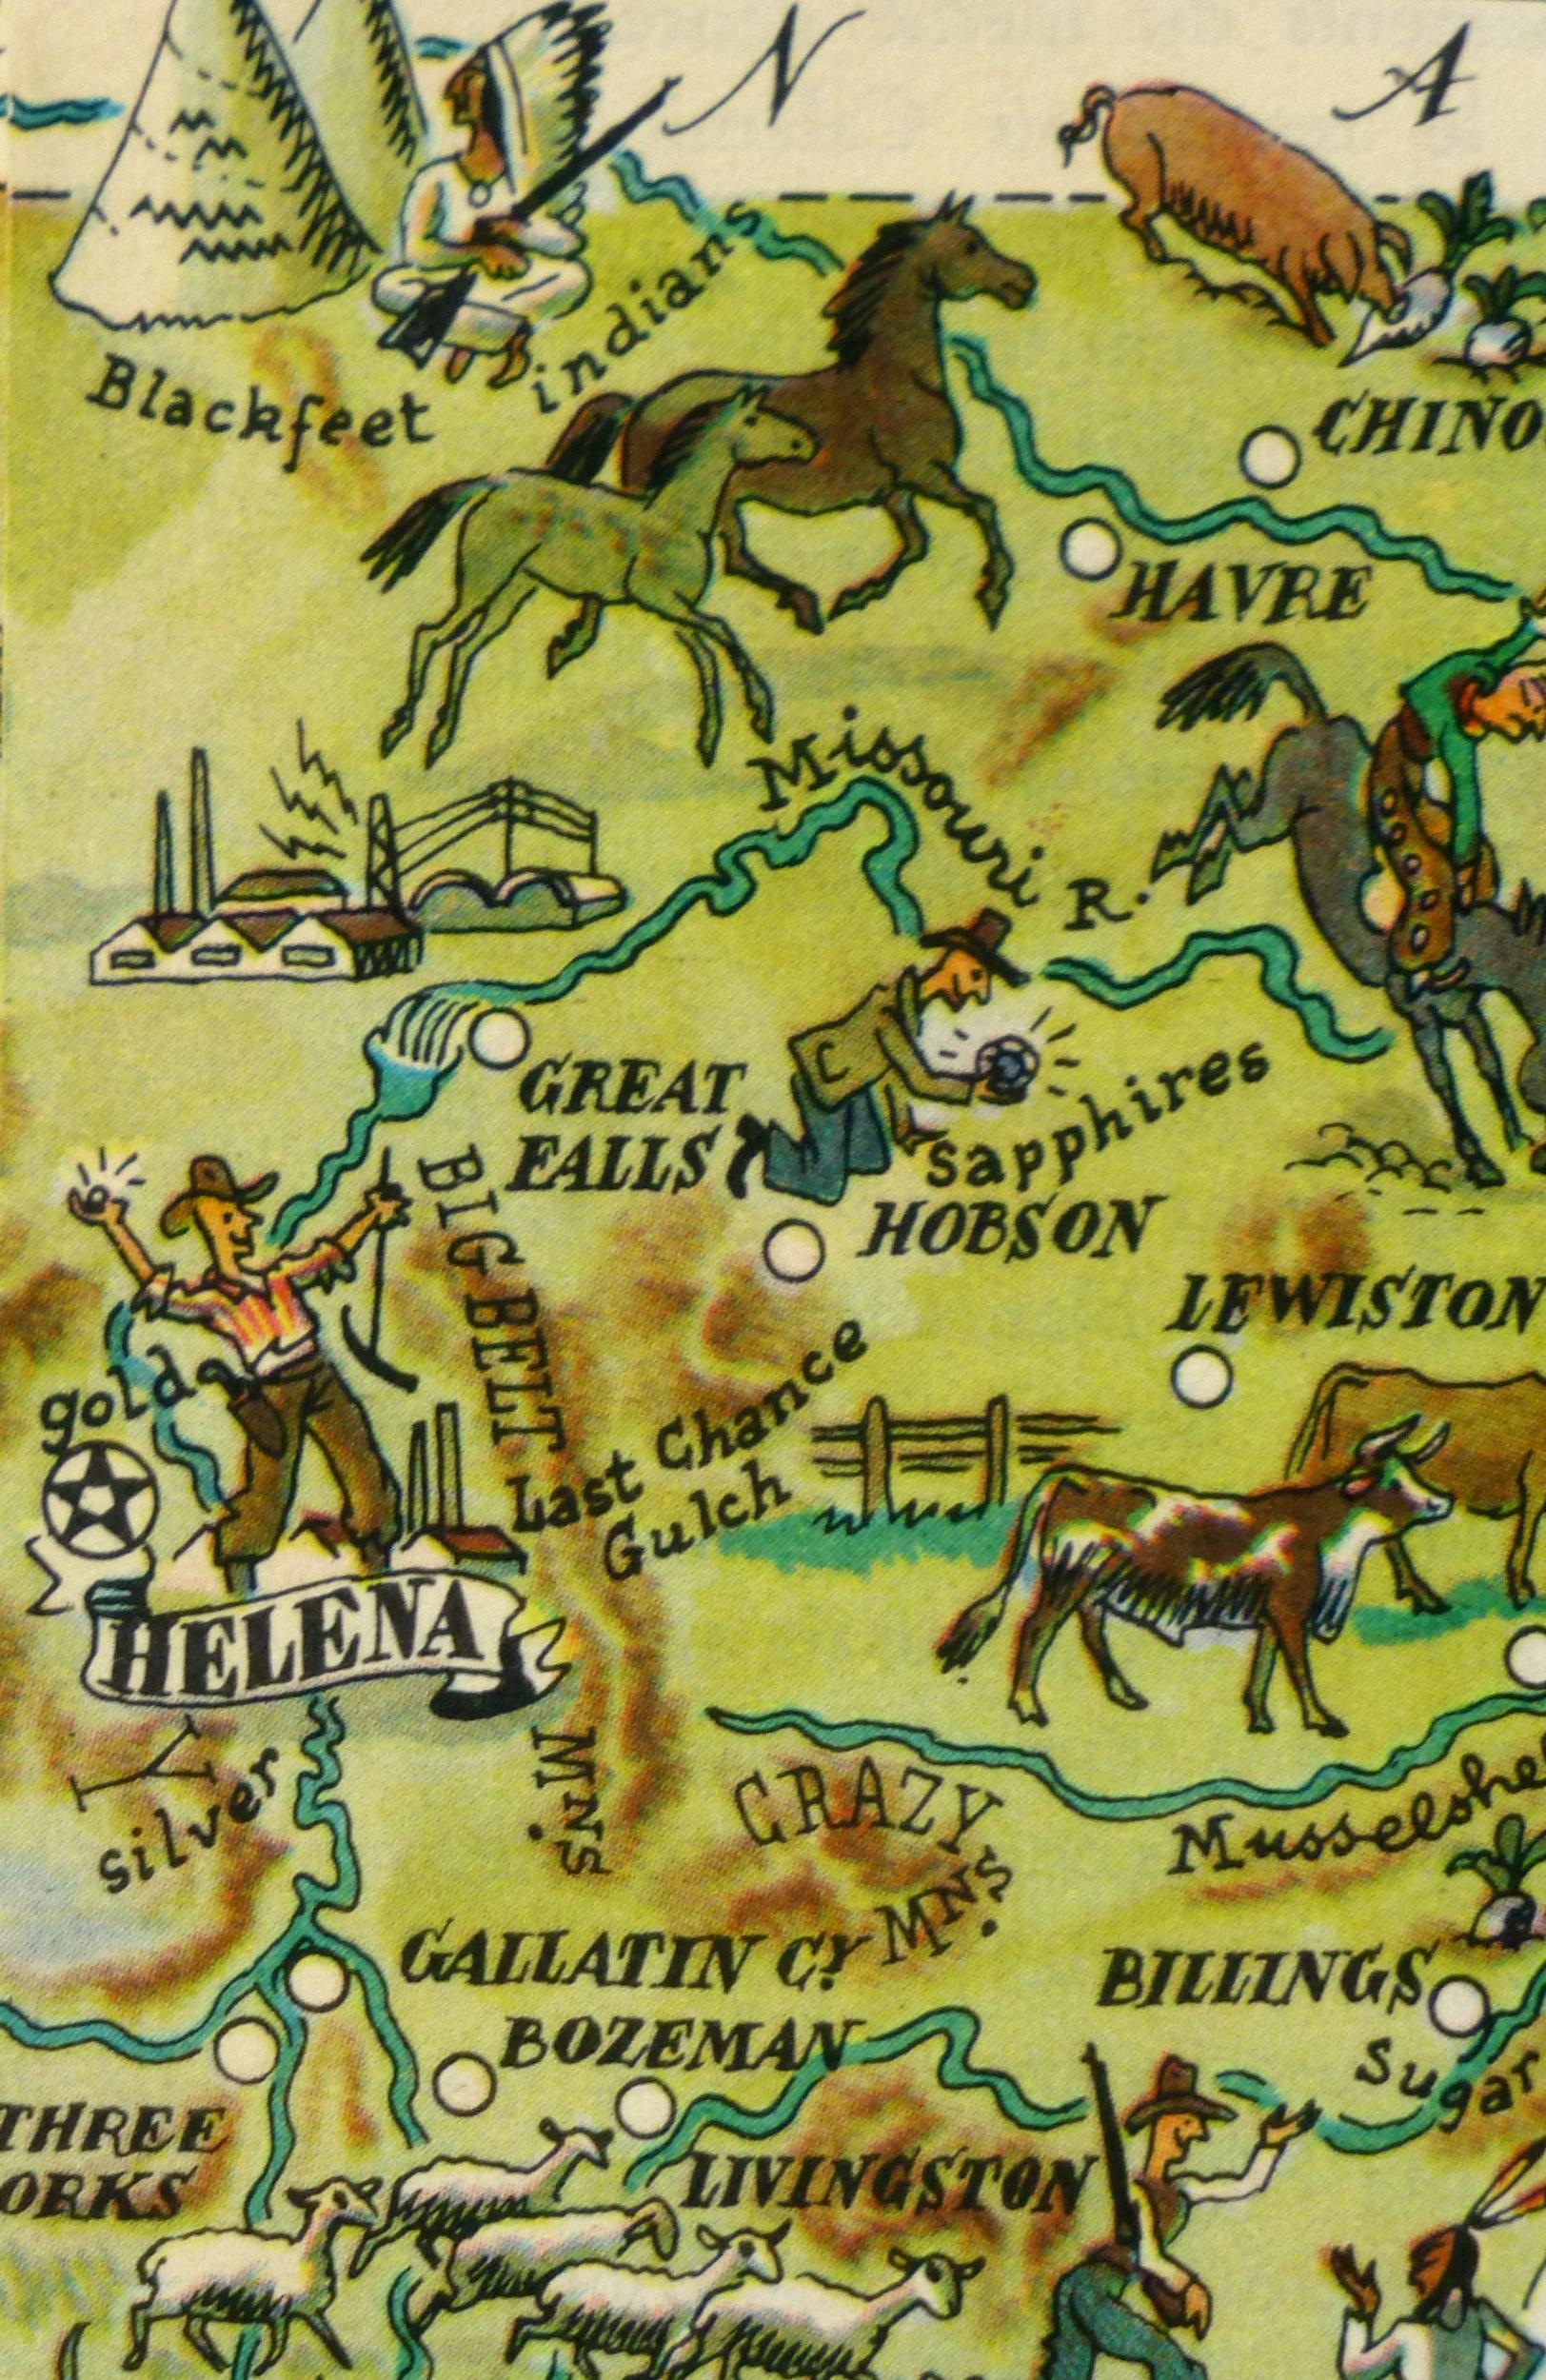 6272K-002 United States Map Kansas And Oklahoma on kansas and michigan map, kansas and missouri map, kansas and mississippi map, kansas and iowa map, kansas and nebraska map, kansas and texas map,